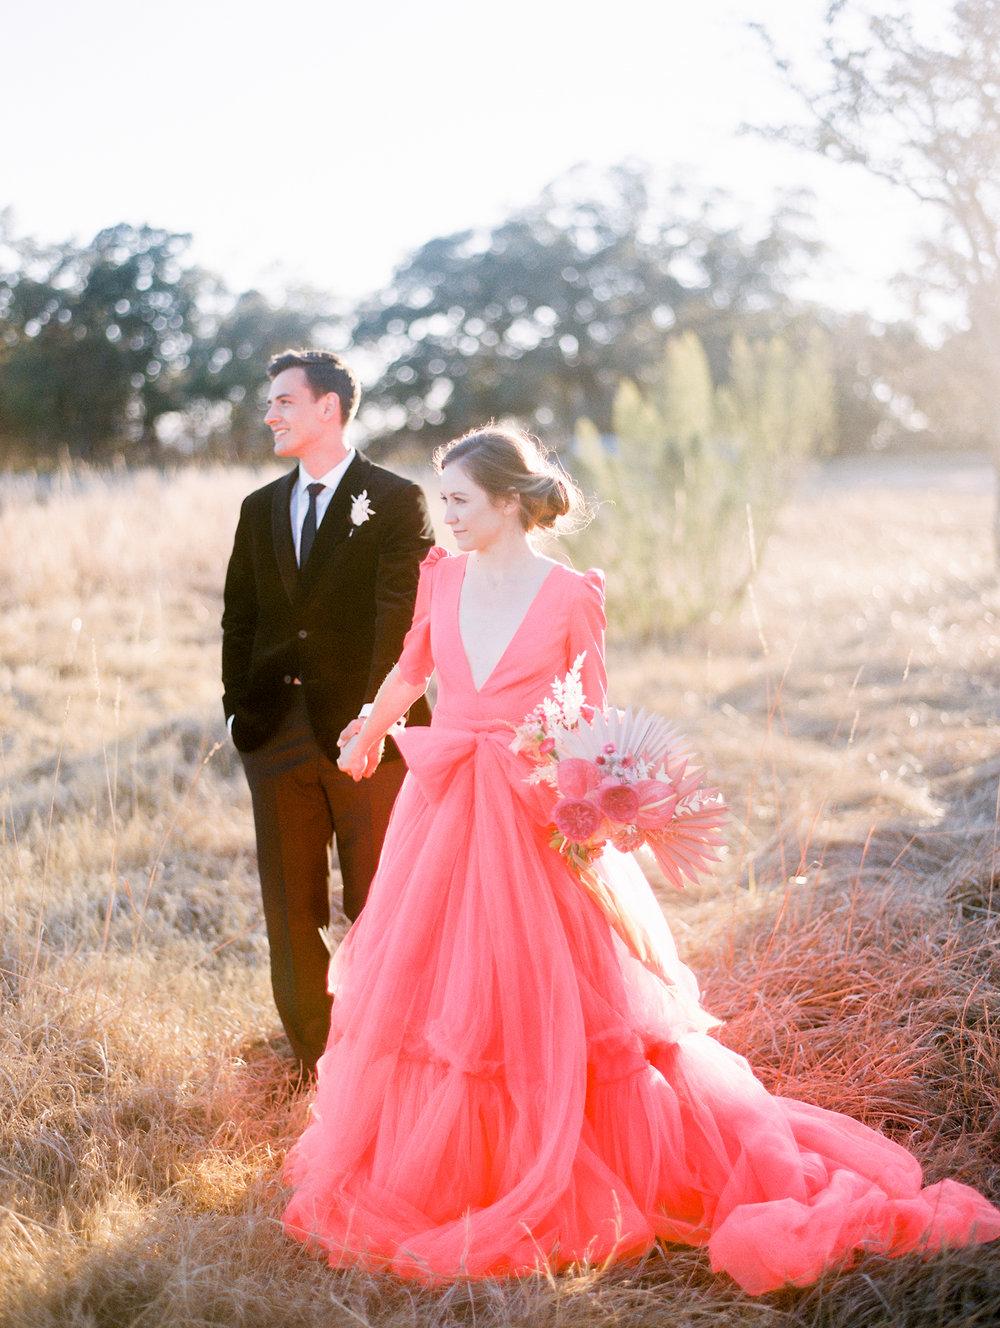 Kristin-La-Voie-Photography-Austin-Wedding-Photographer-Prospect-House-82.jpg